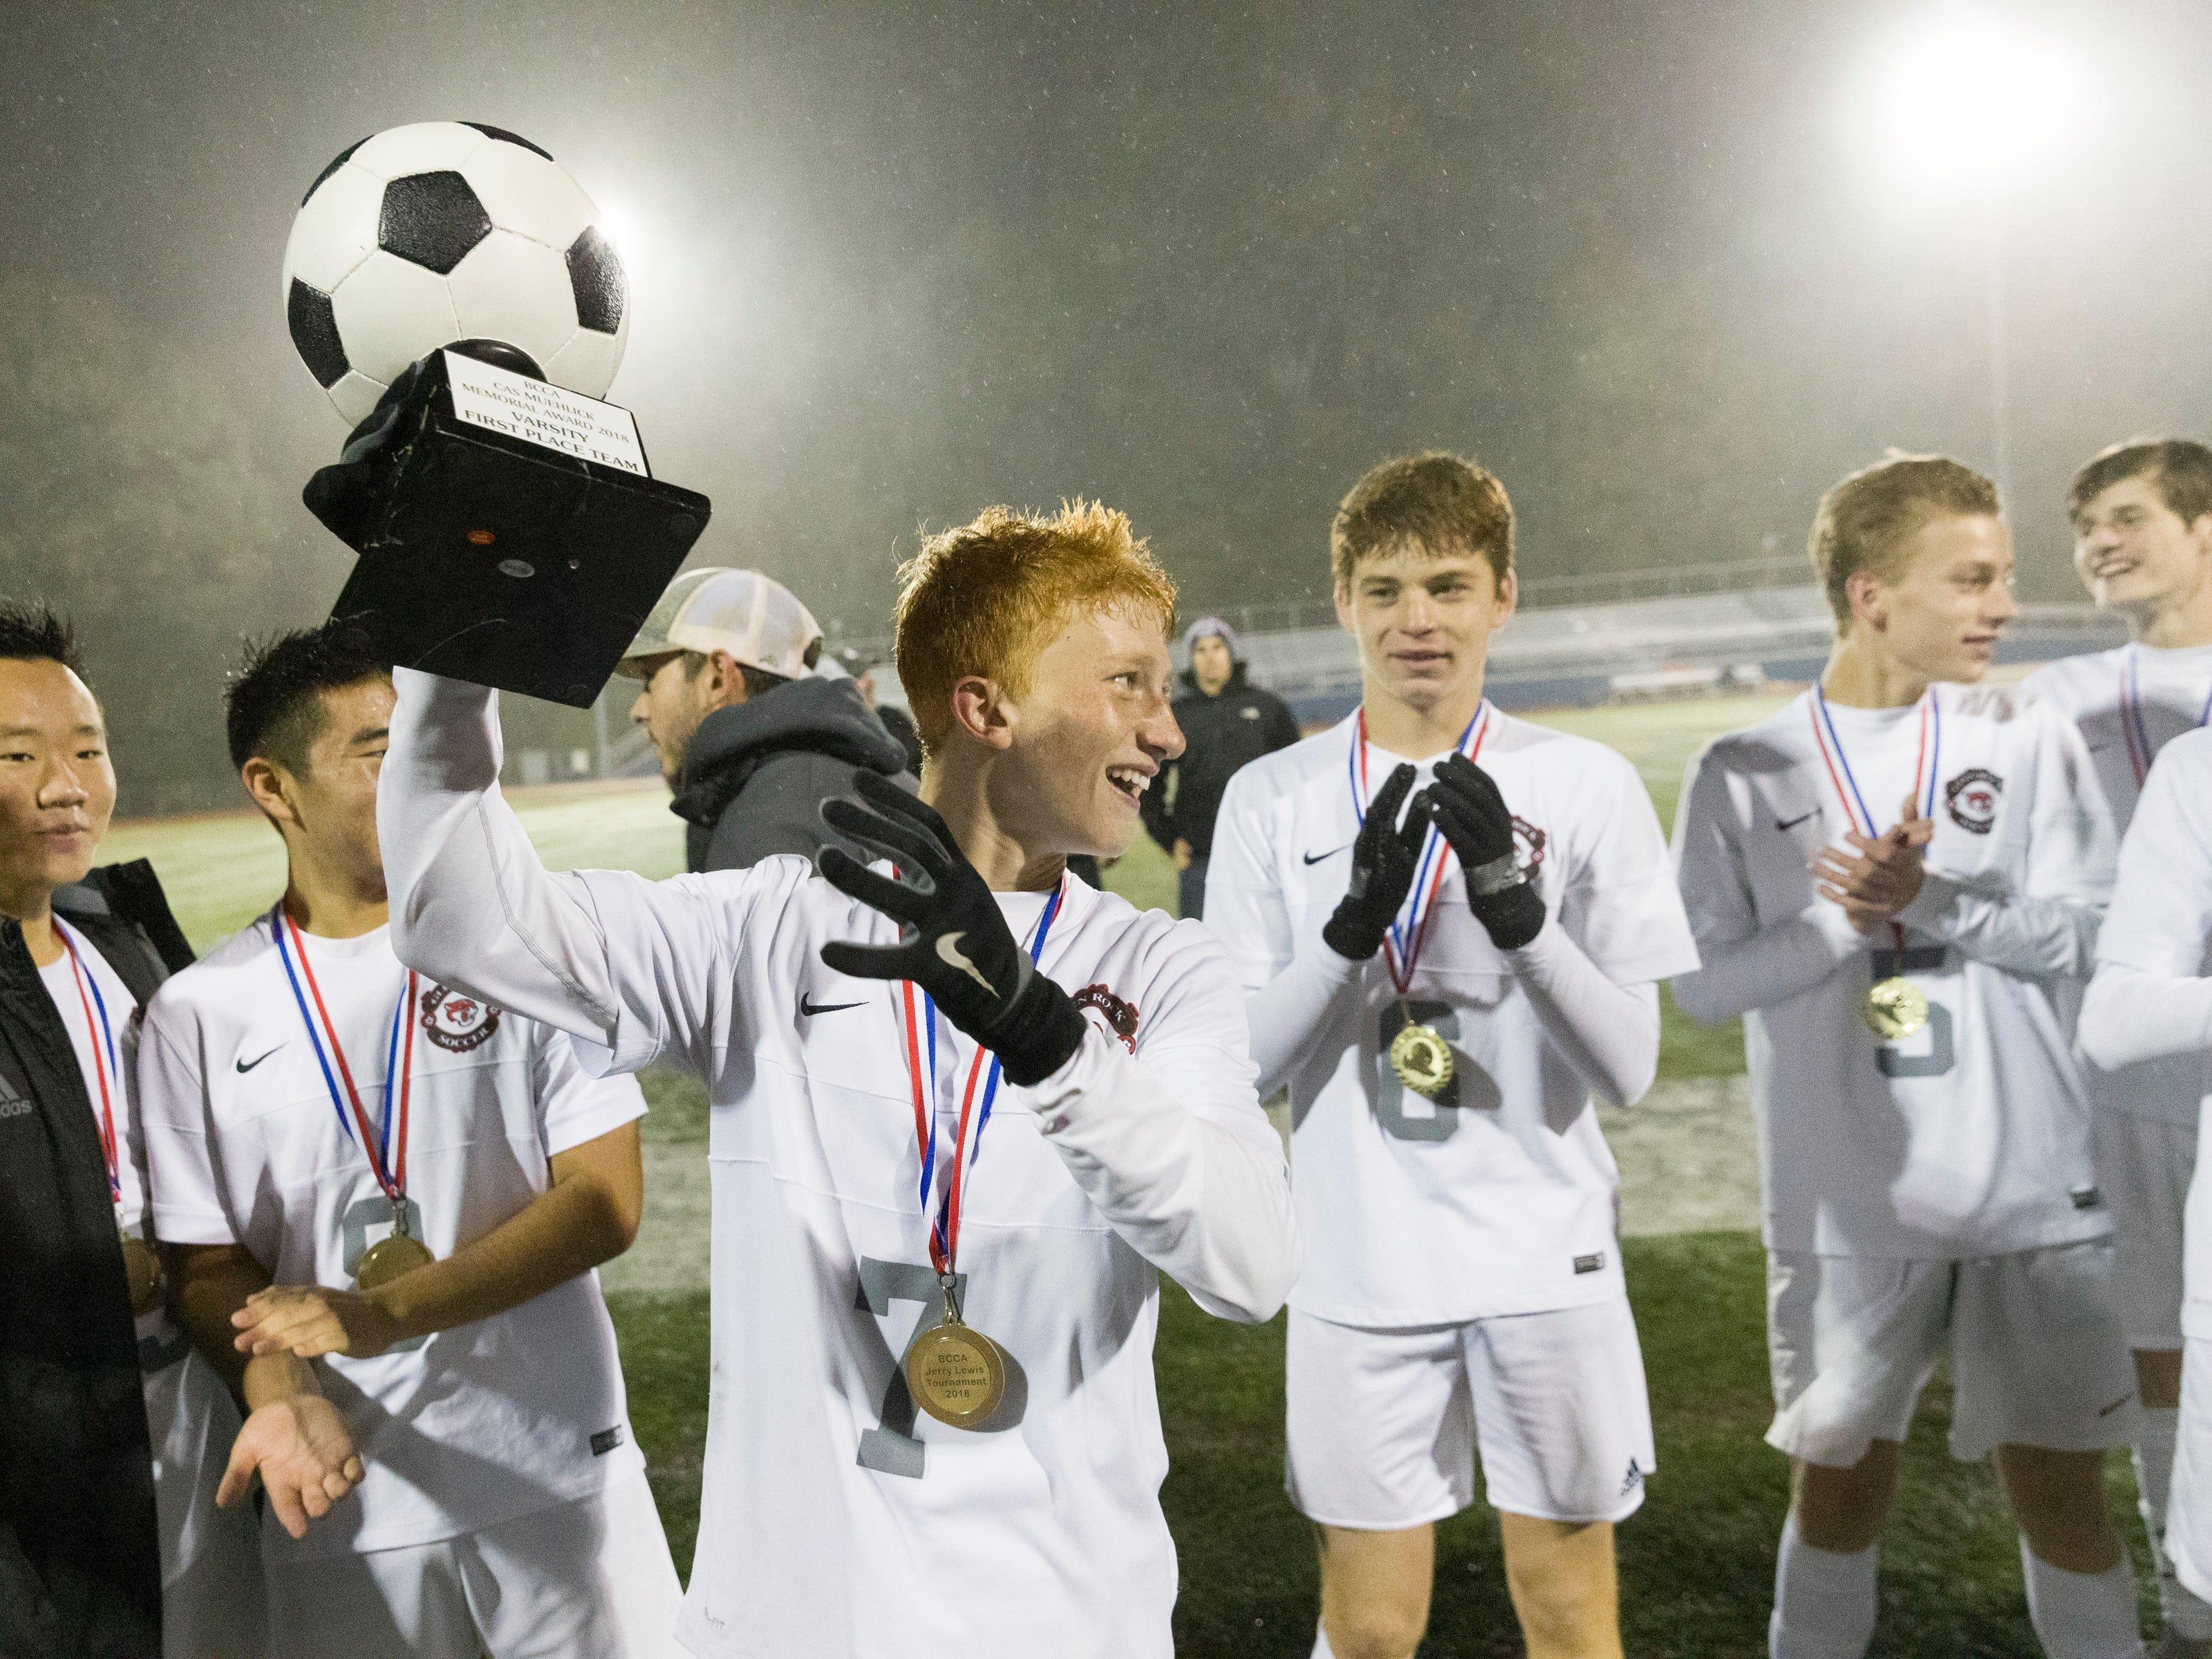 OAKLAND, NJ 10/27/2018  Glen Rock's Ben Zakowski (7) raises the trophy after his team's 3-0 victory over Ramsey in Saturday night's Bergen County Boys High School Soccer Tournament final.